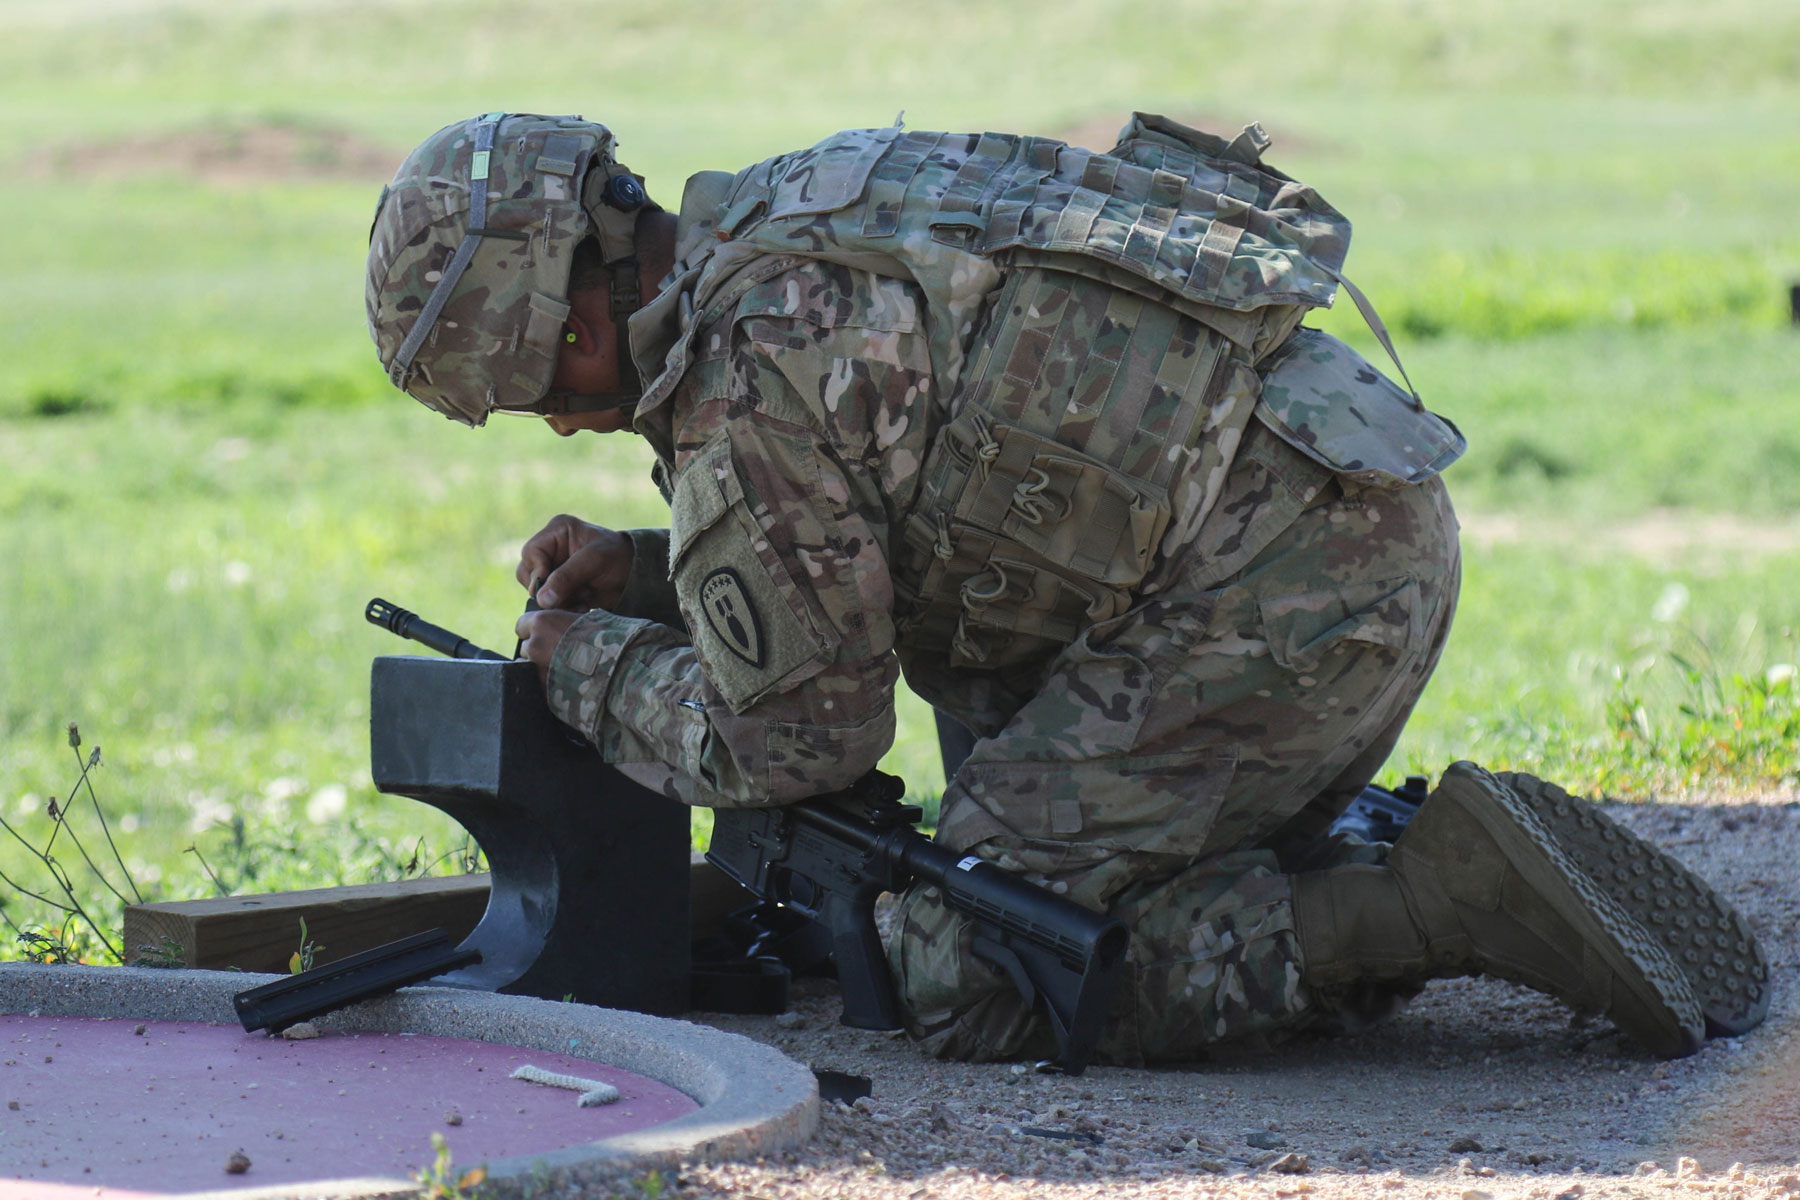 Clock Adds Pressure in Fort Carson Bomb-Disposal Contest